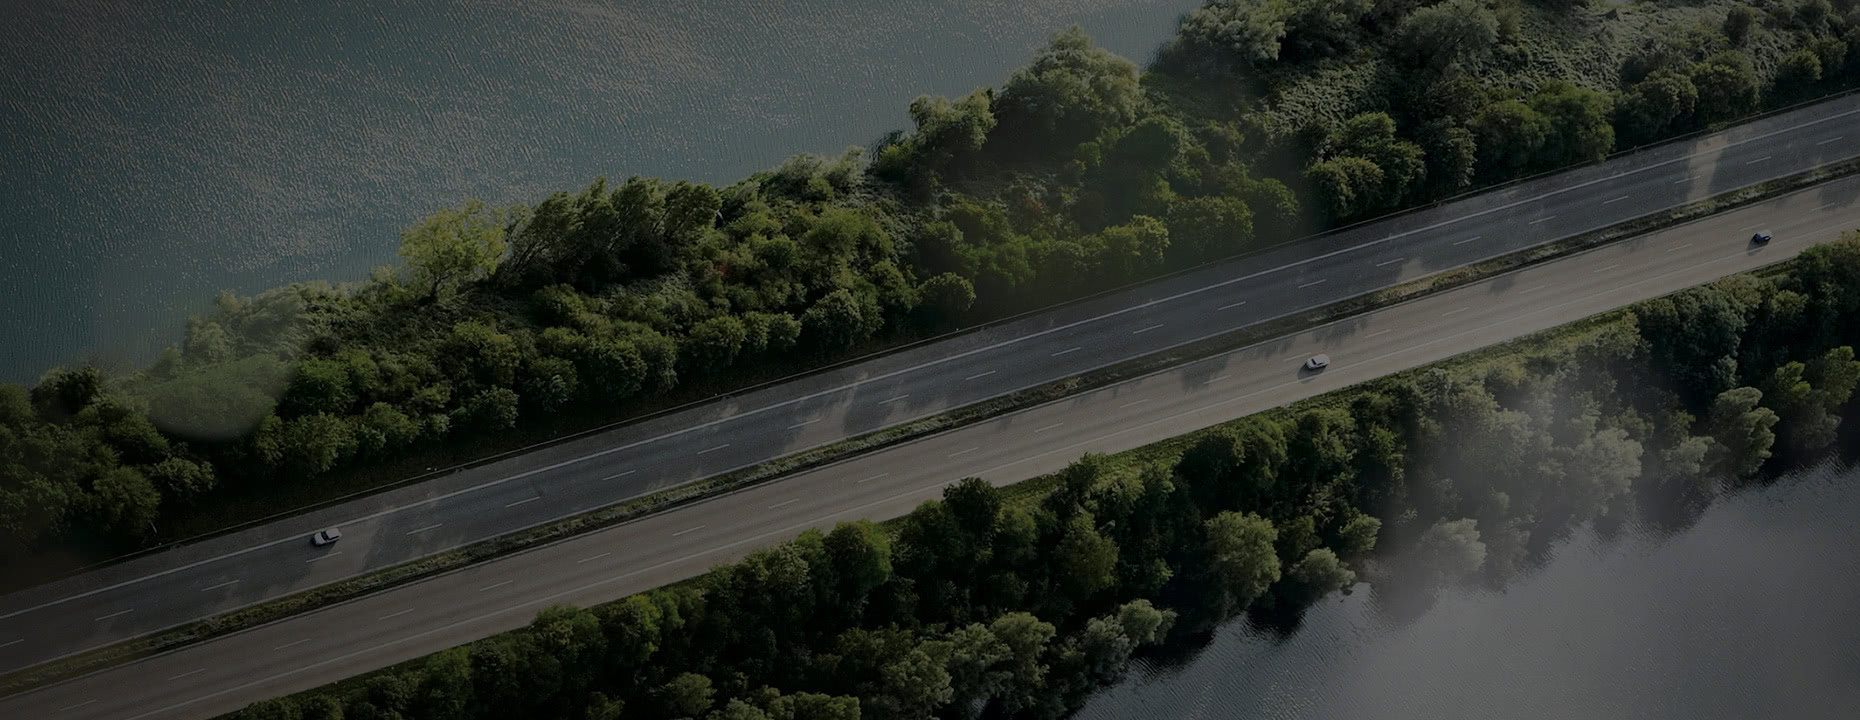 HYUNDAI ТА UBER ПРЕДСТАВИЛИ ЕЛЕКТРИЧНЕ АЕРОТАКСІ | Автотрейдінг-Одесса ДП - фото 11